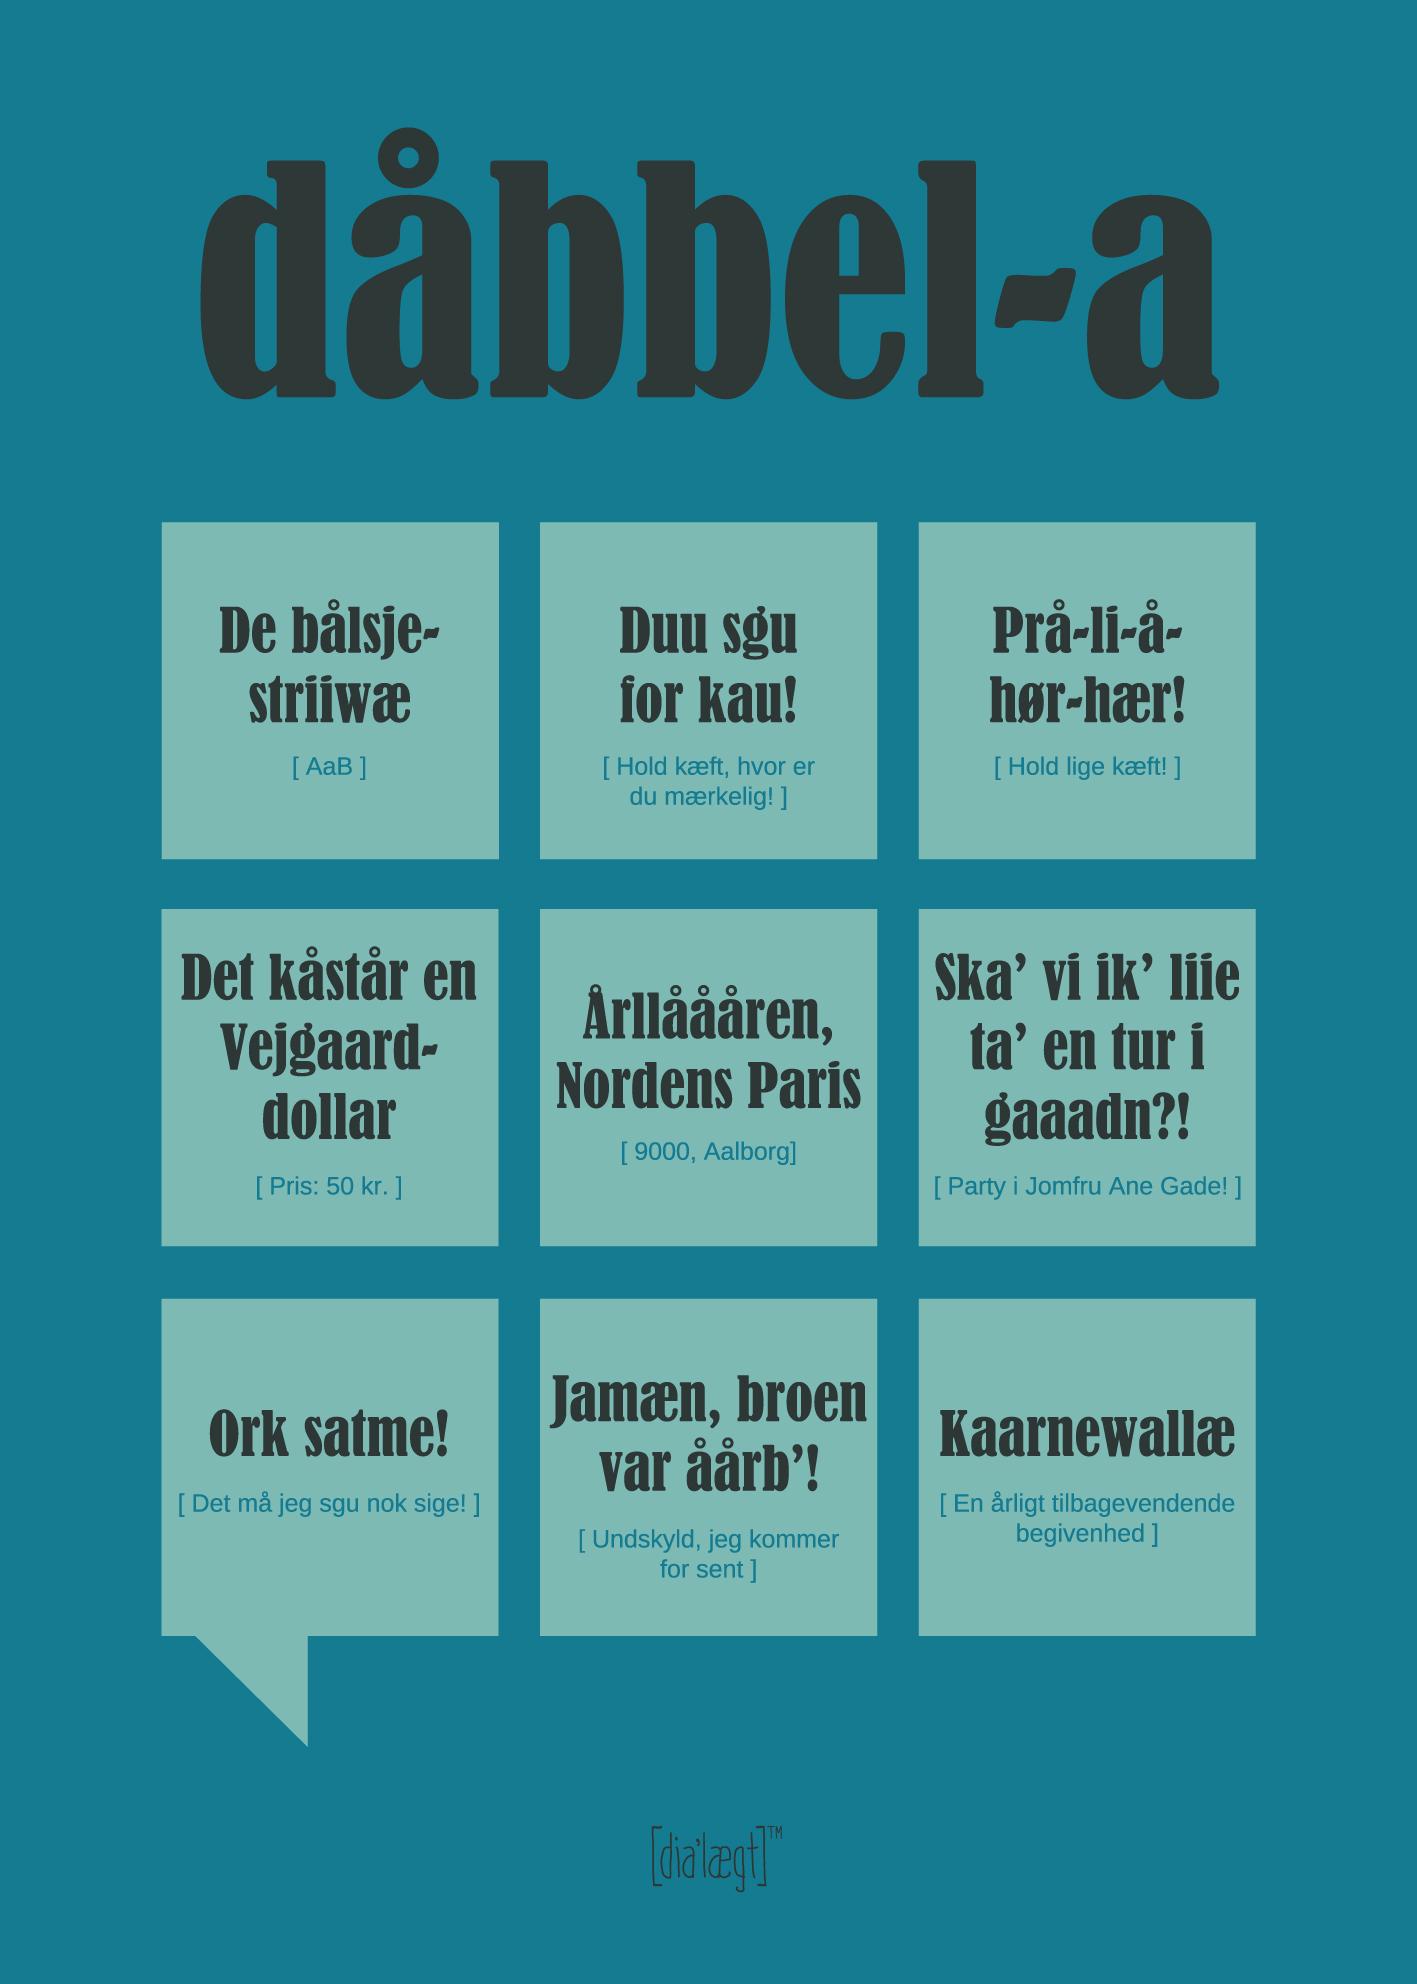 nordjysk dialekt plakat